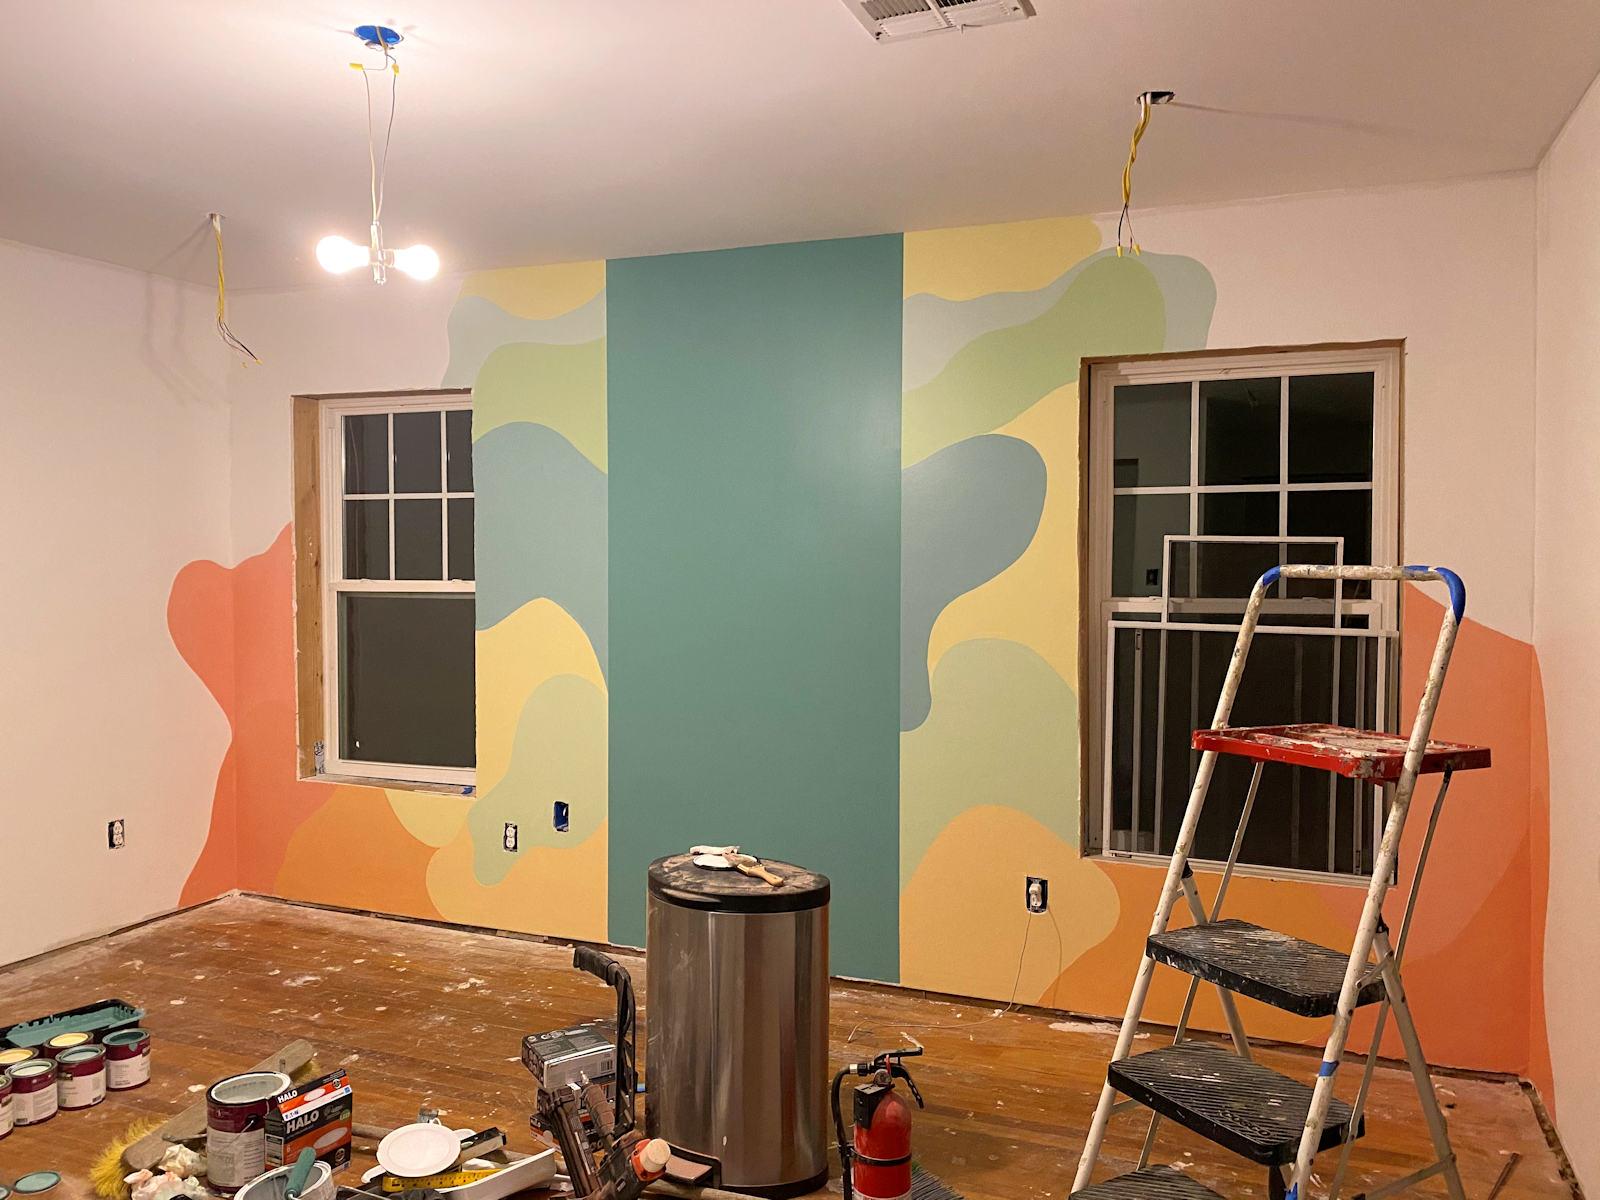 home gym walls with freeform design 4